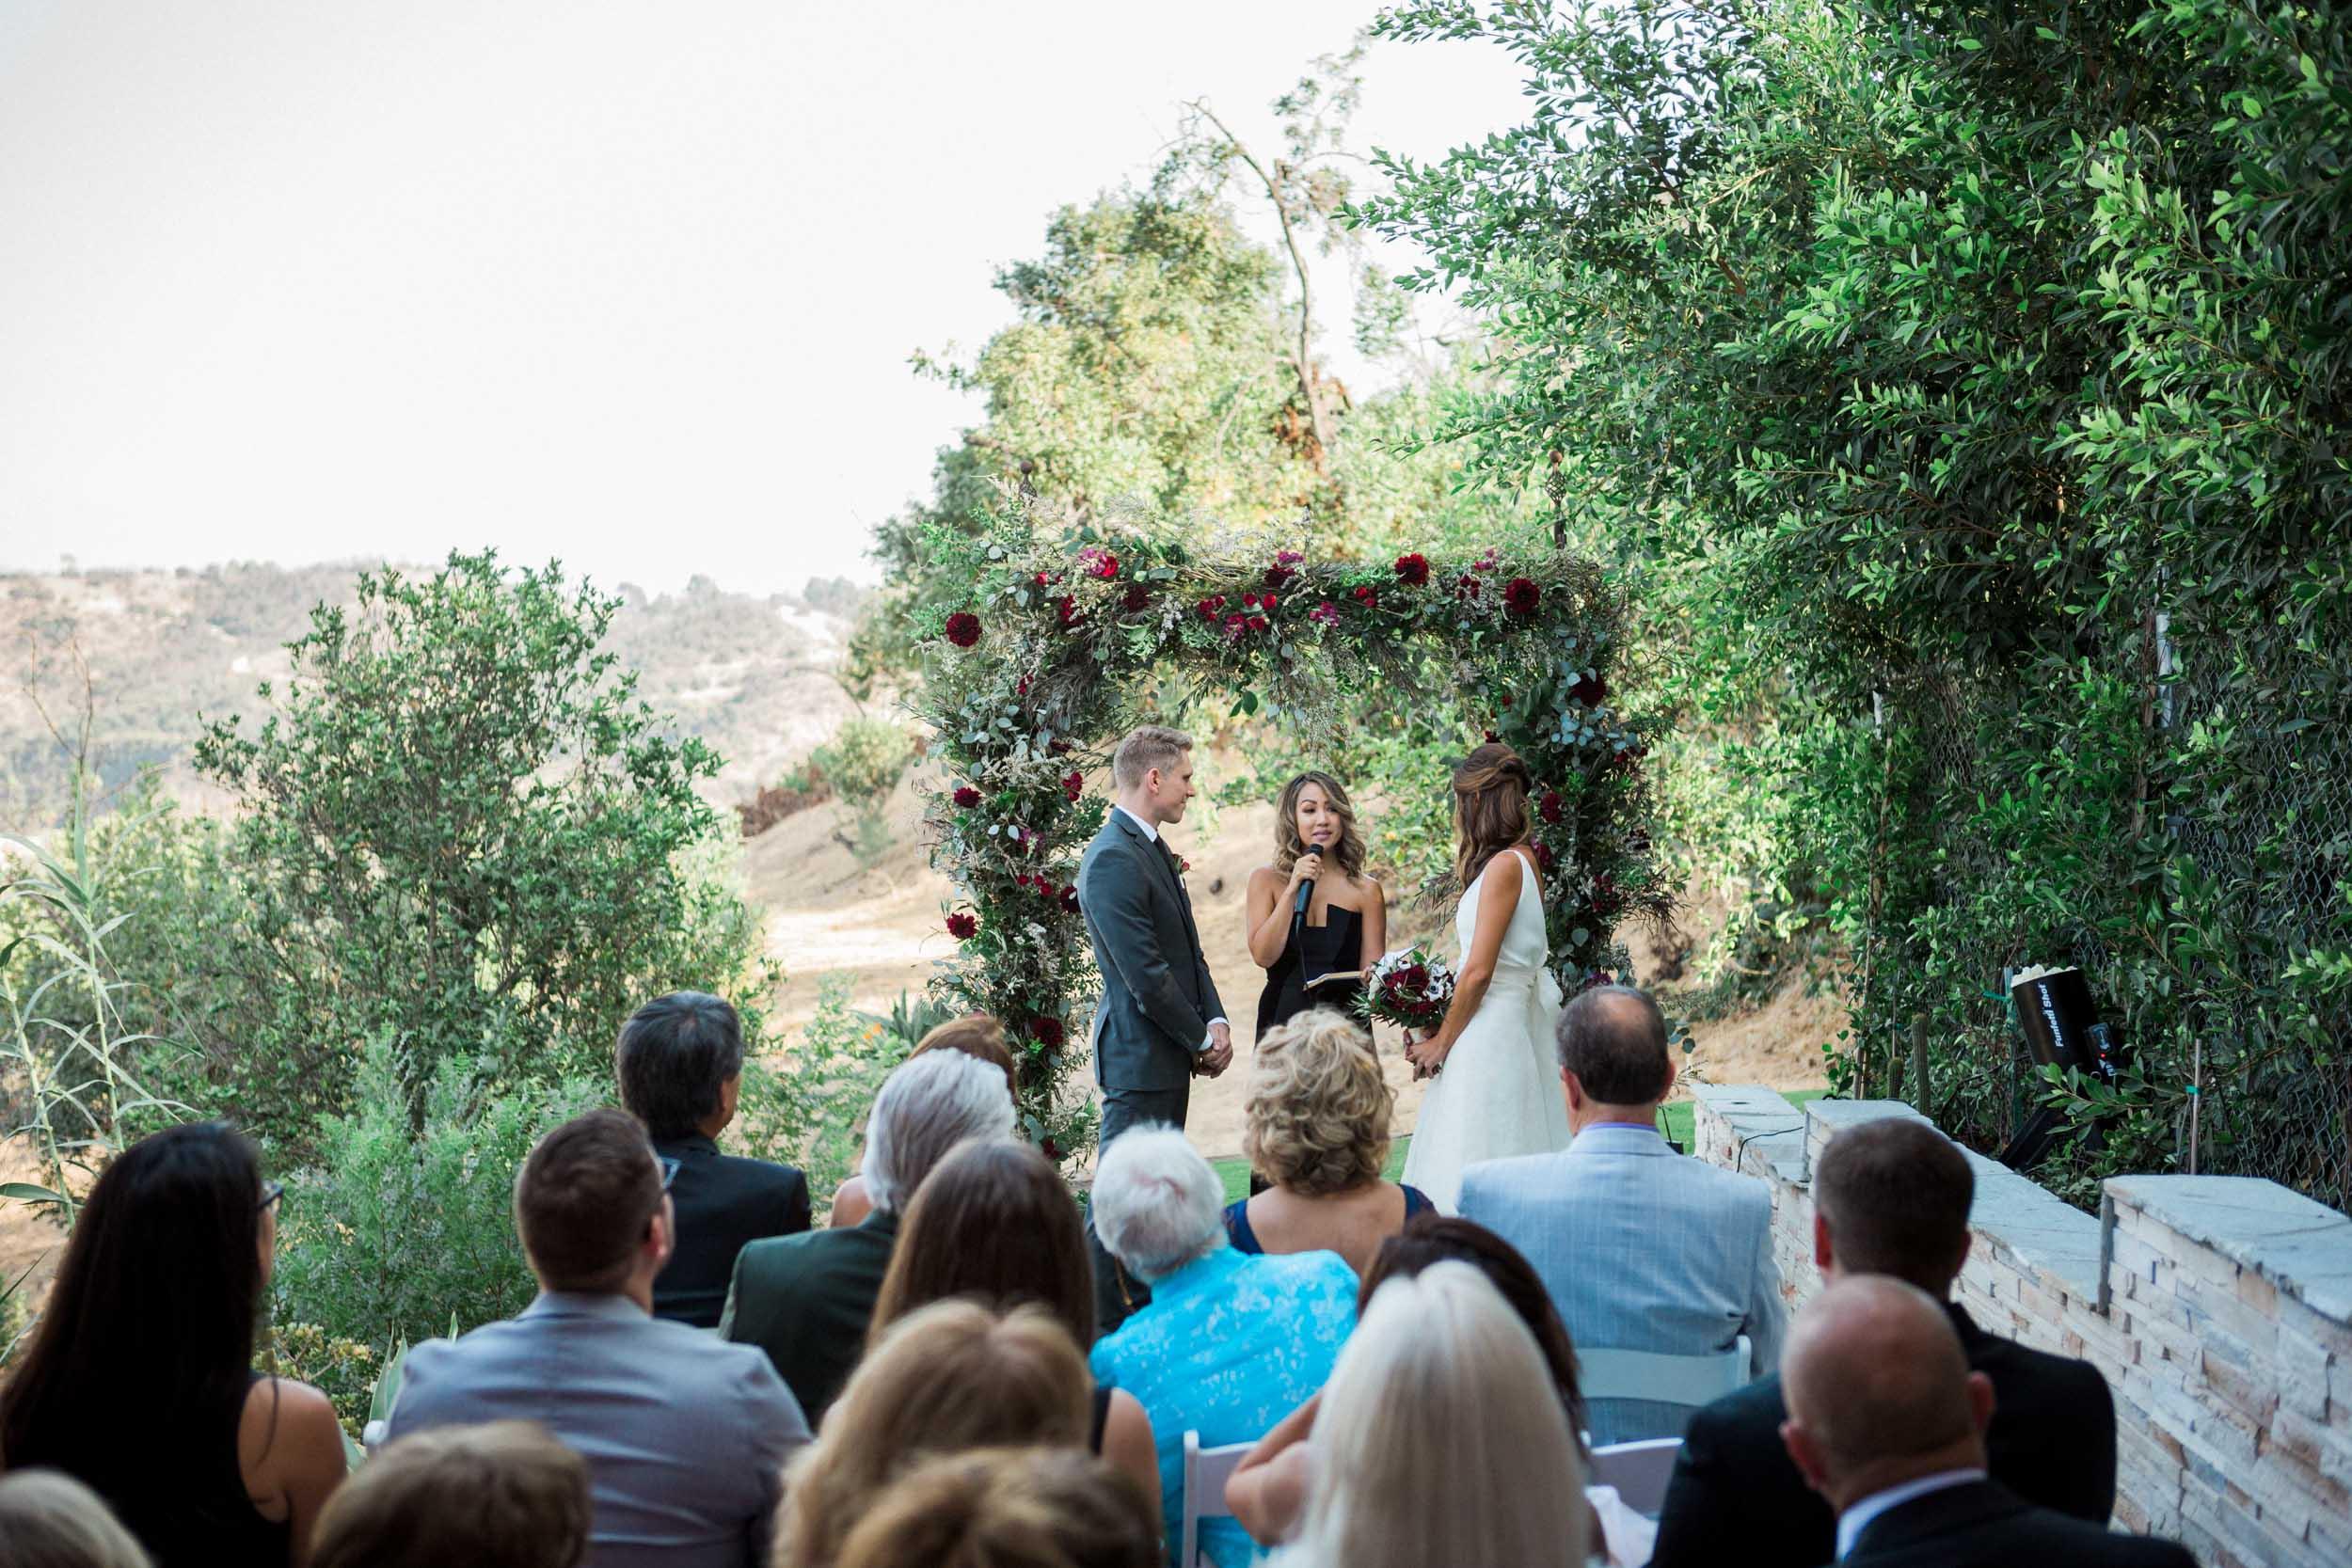 BKM-Photography-Highland-Park-Los-Angeles-Backyard-Wedding-0028.jpg